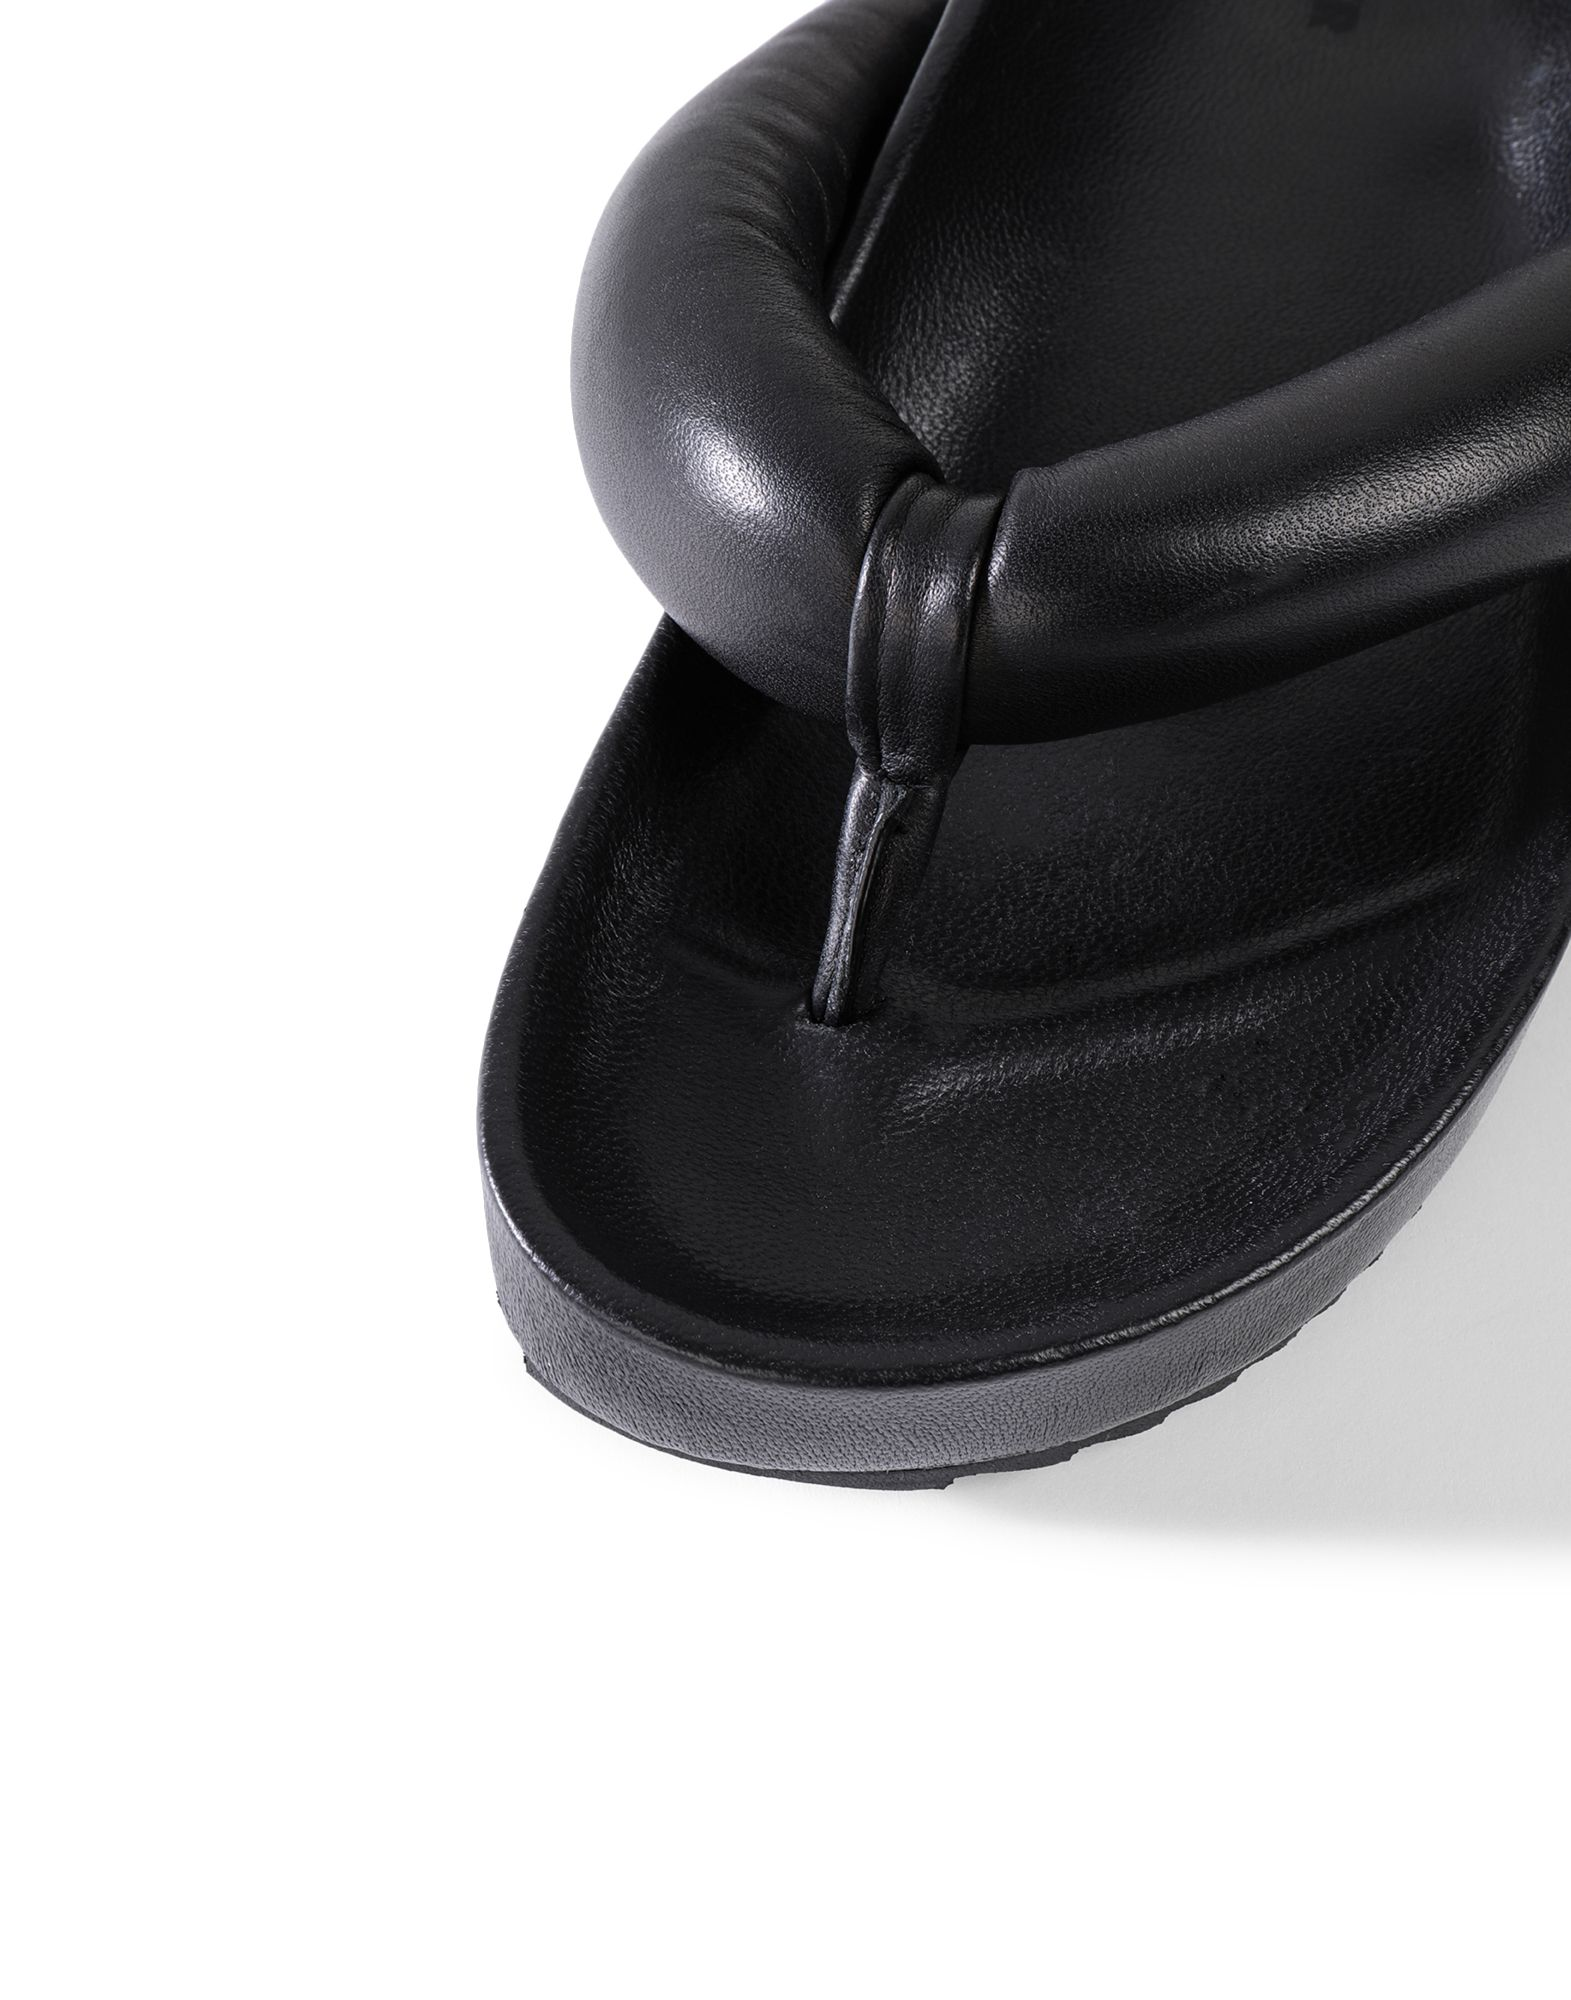 Flip flops - JIL SANDER Online Store